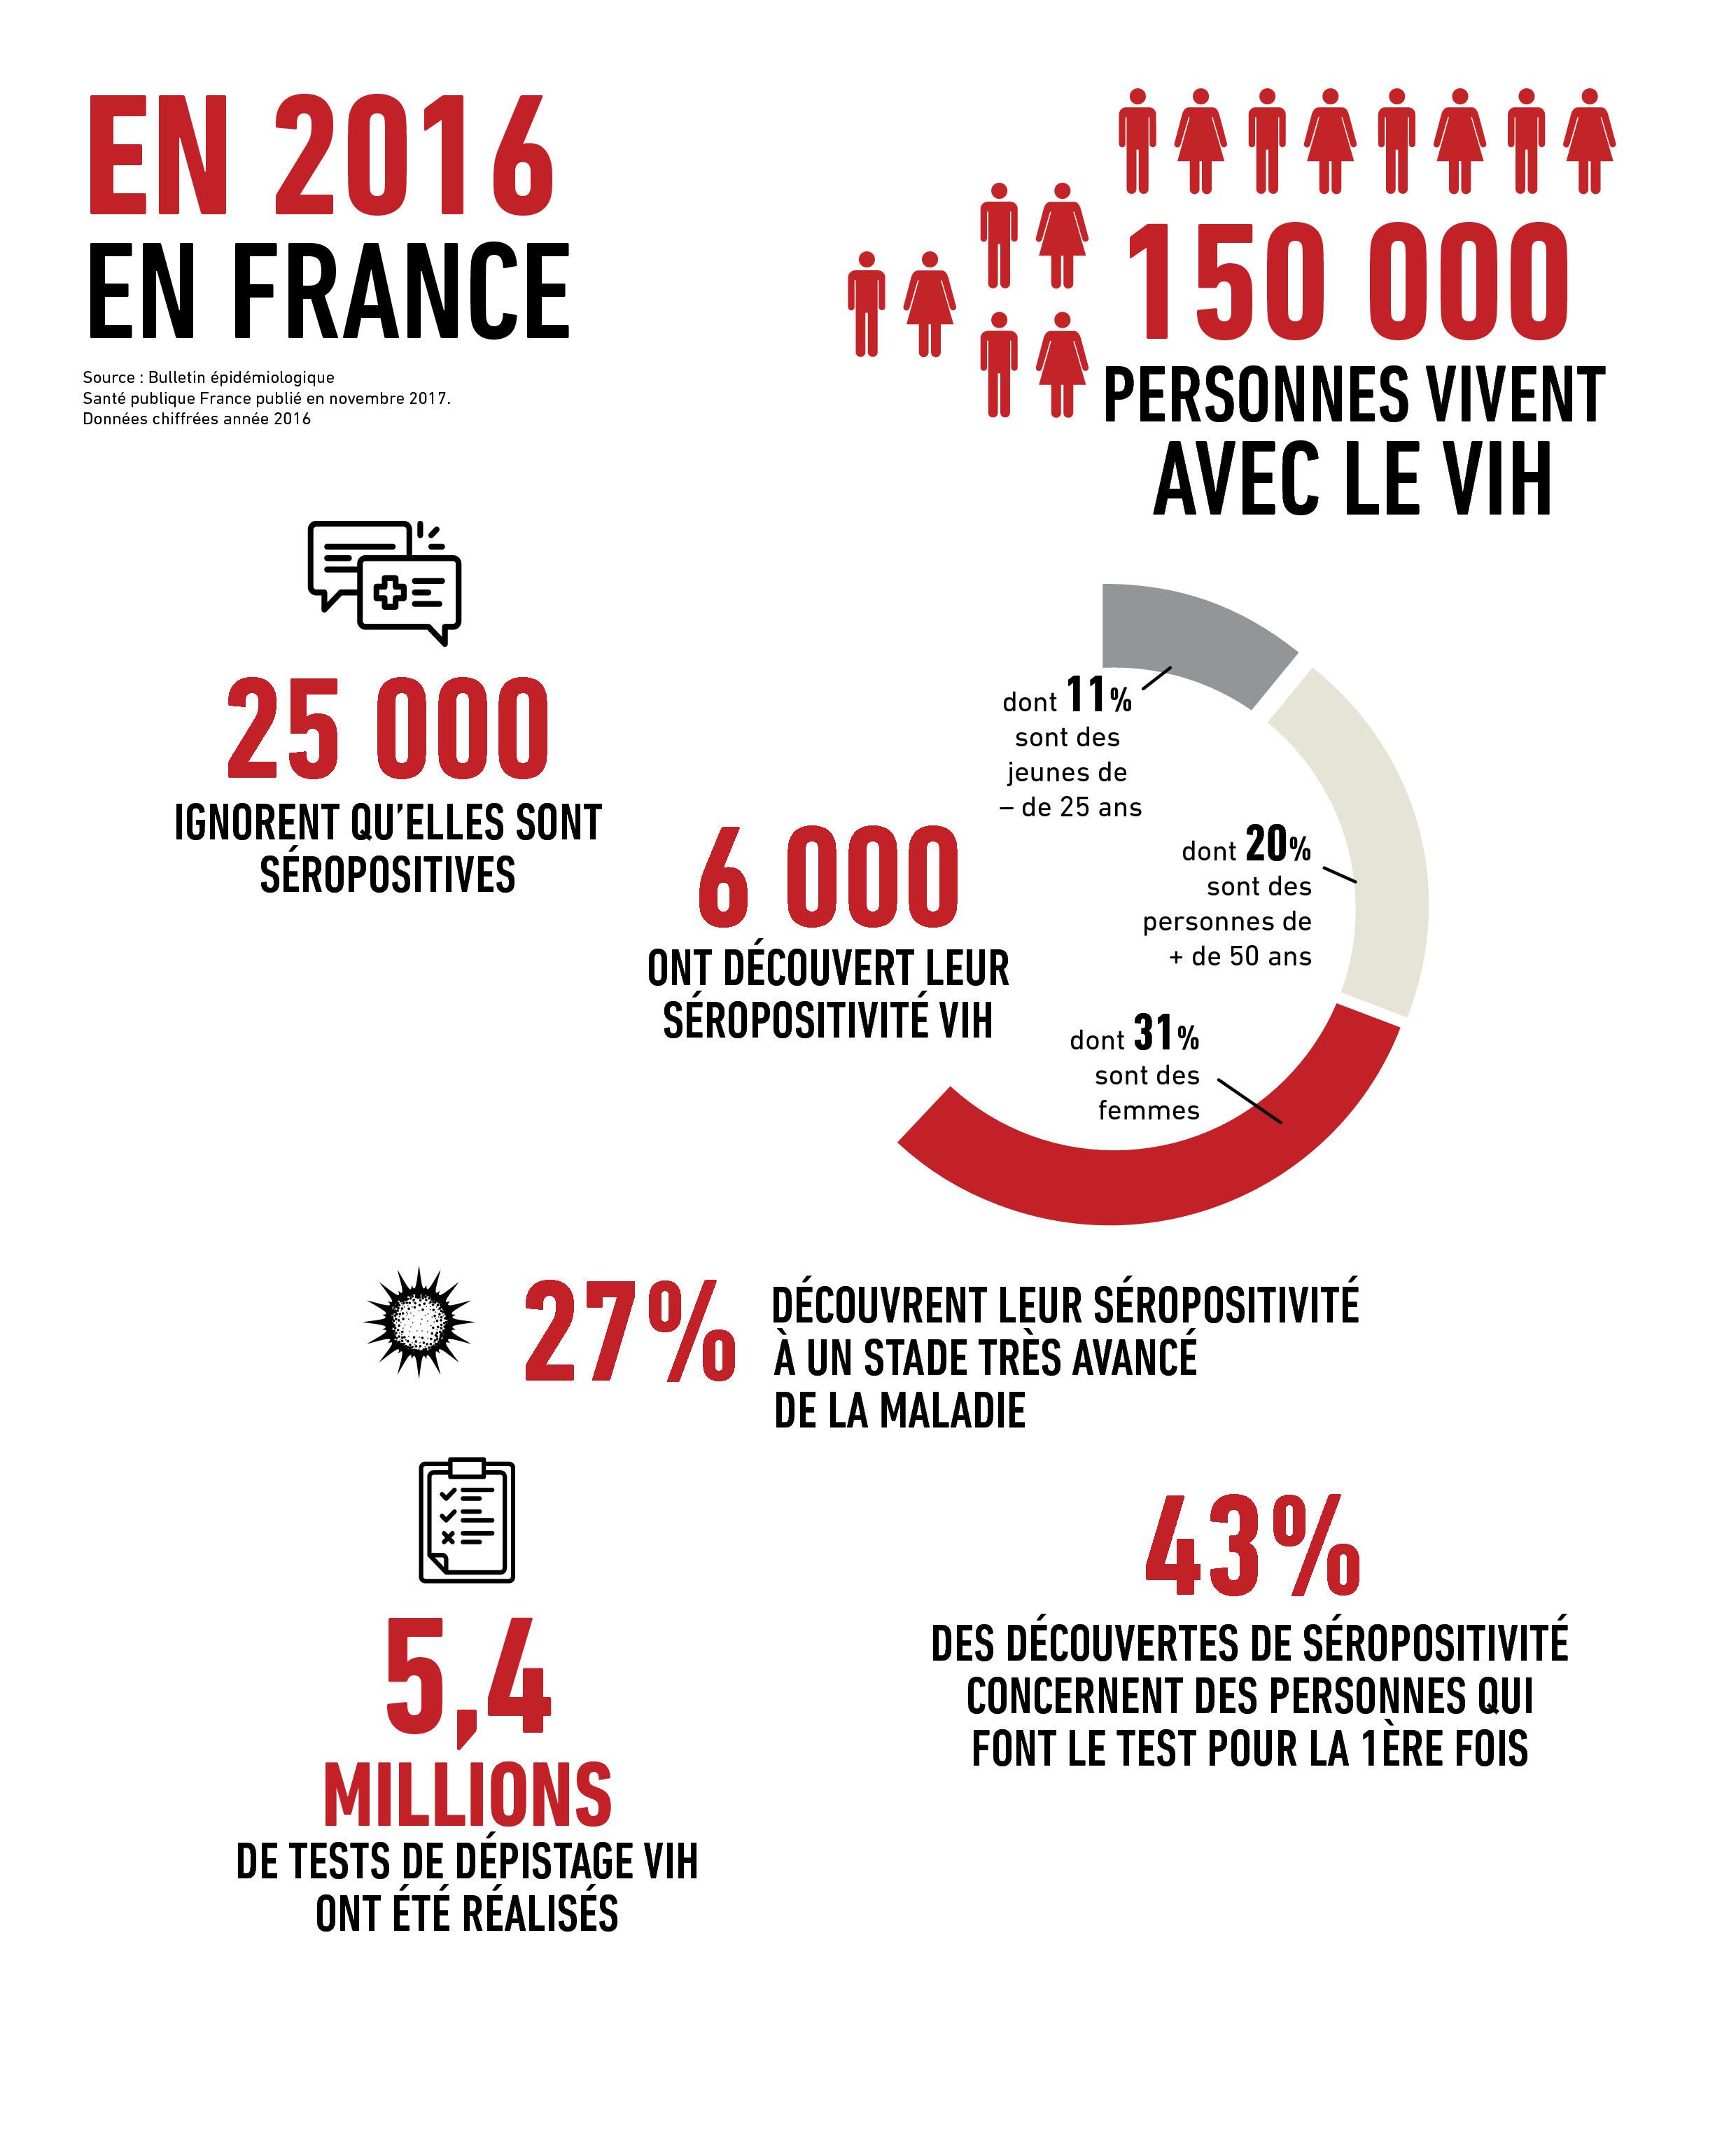 donnees_epidemiologiques_vih_sida_france_sidaction_2016